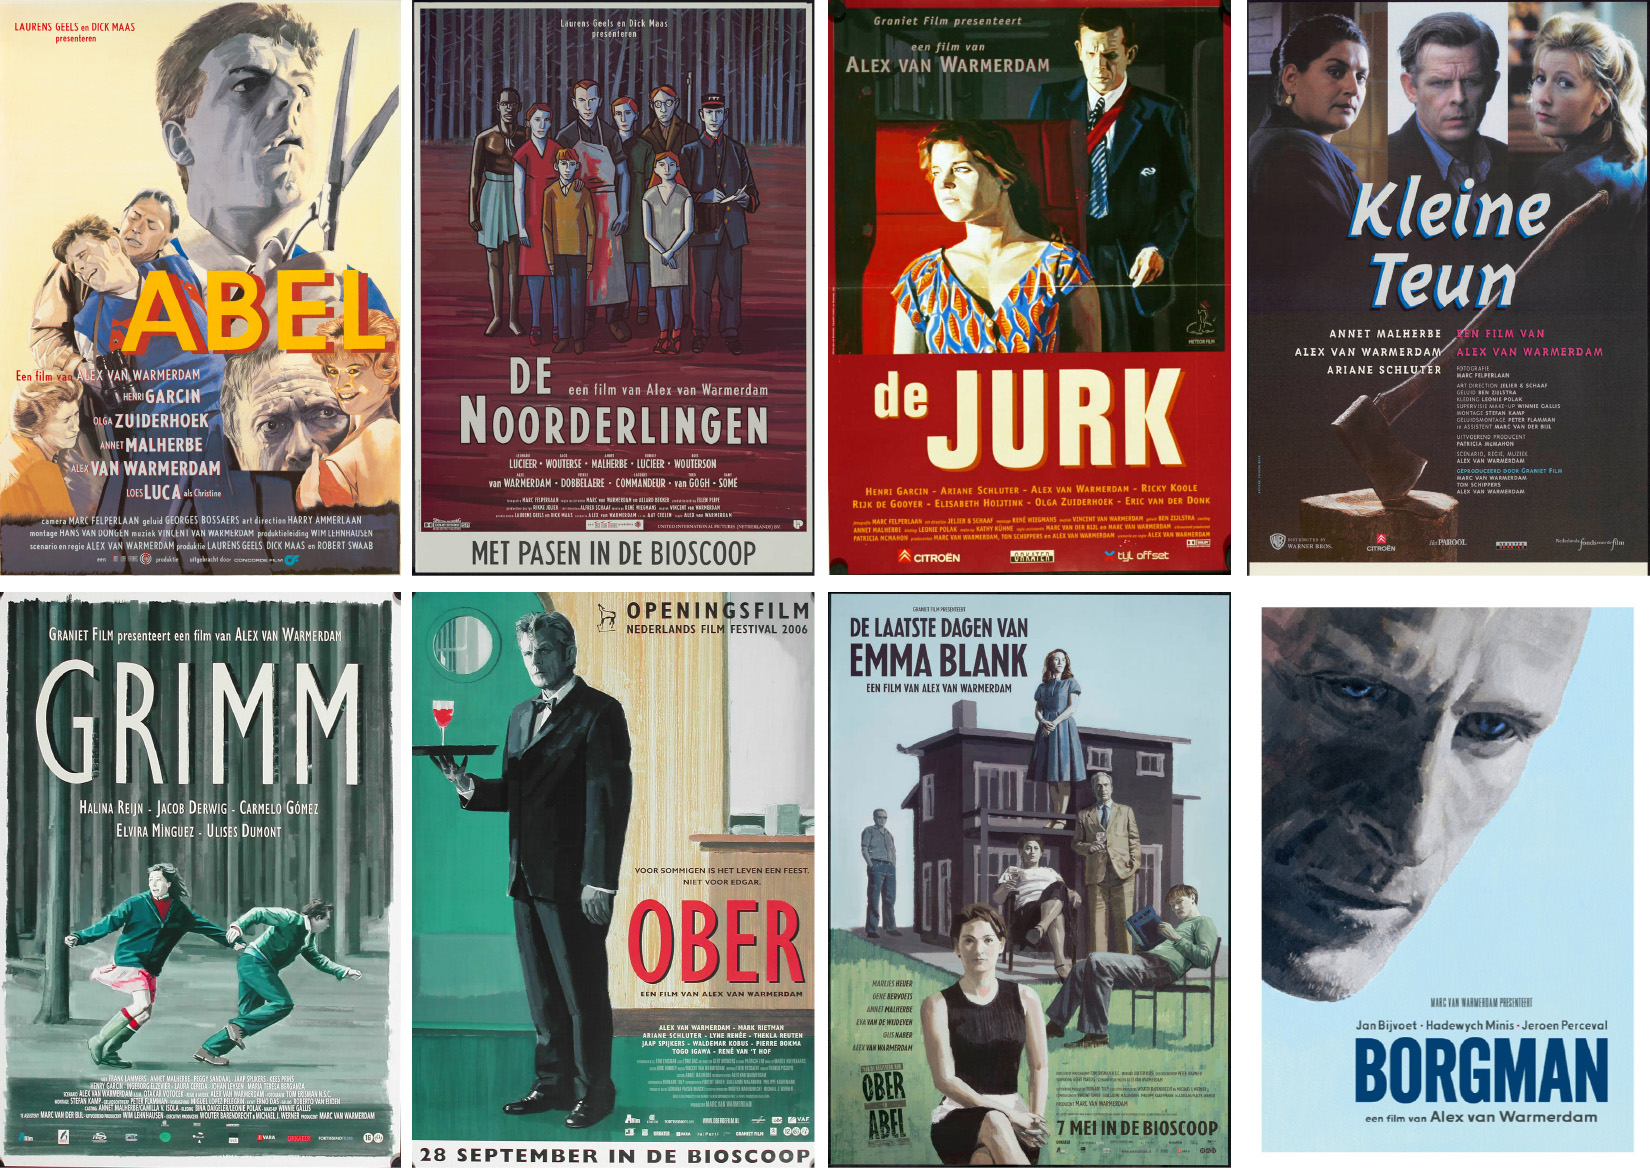 Alex van Warmerdam: filmmaker, schrijver, schilder